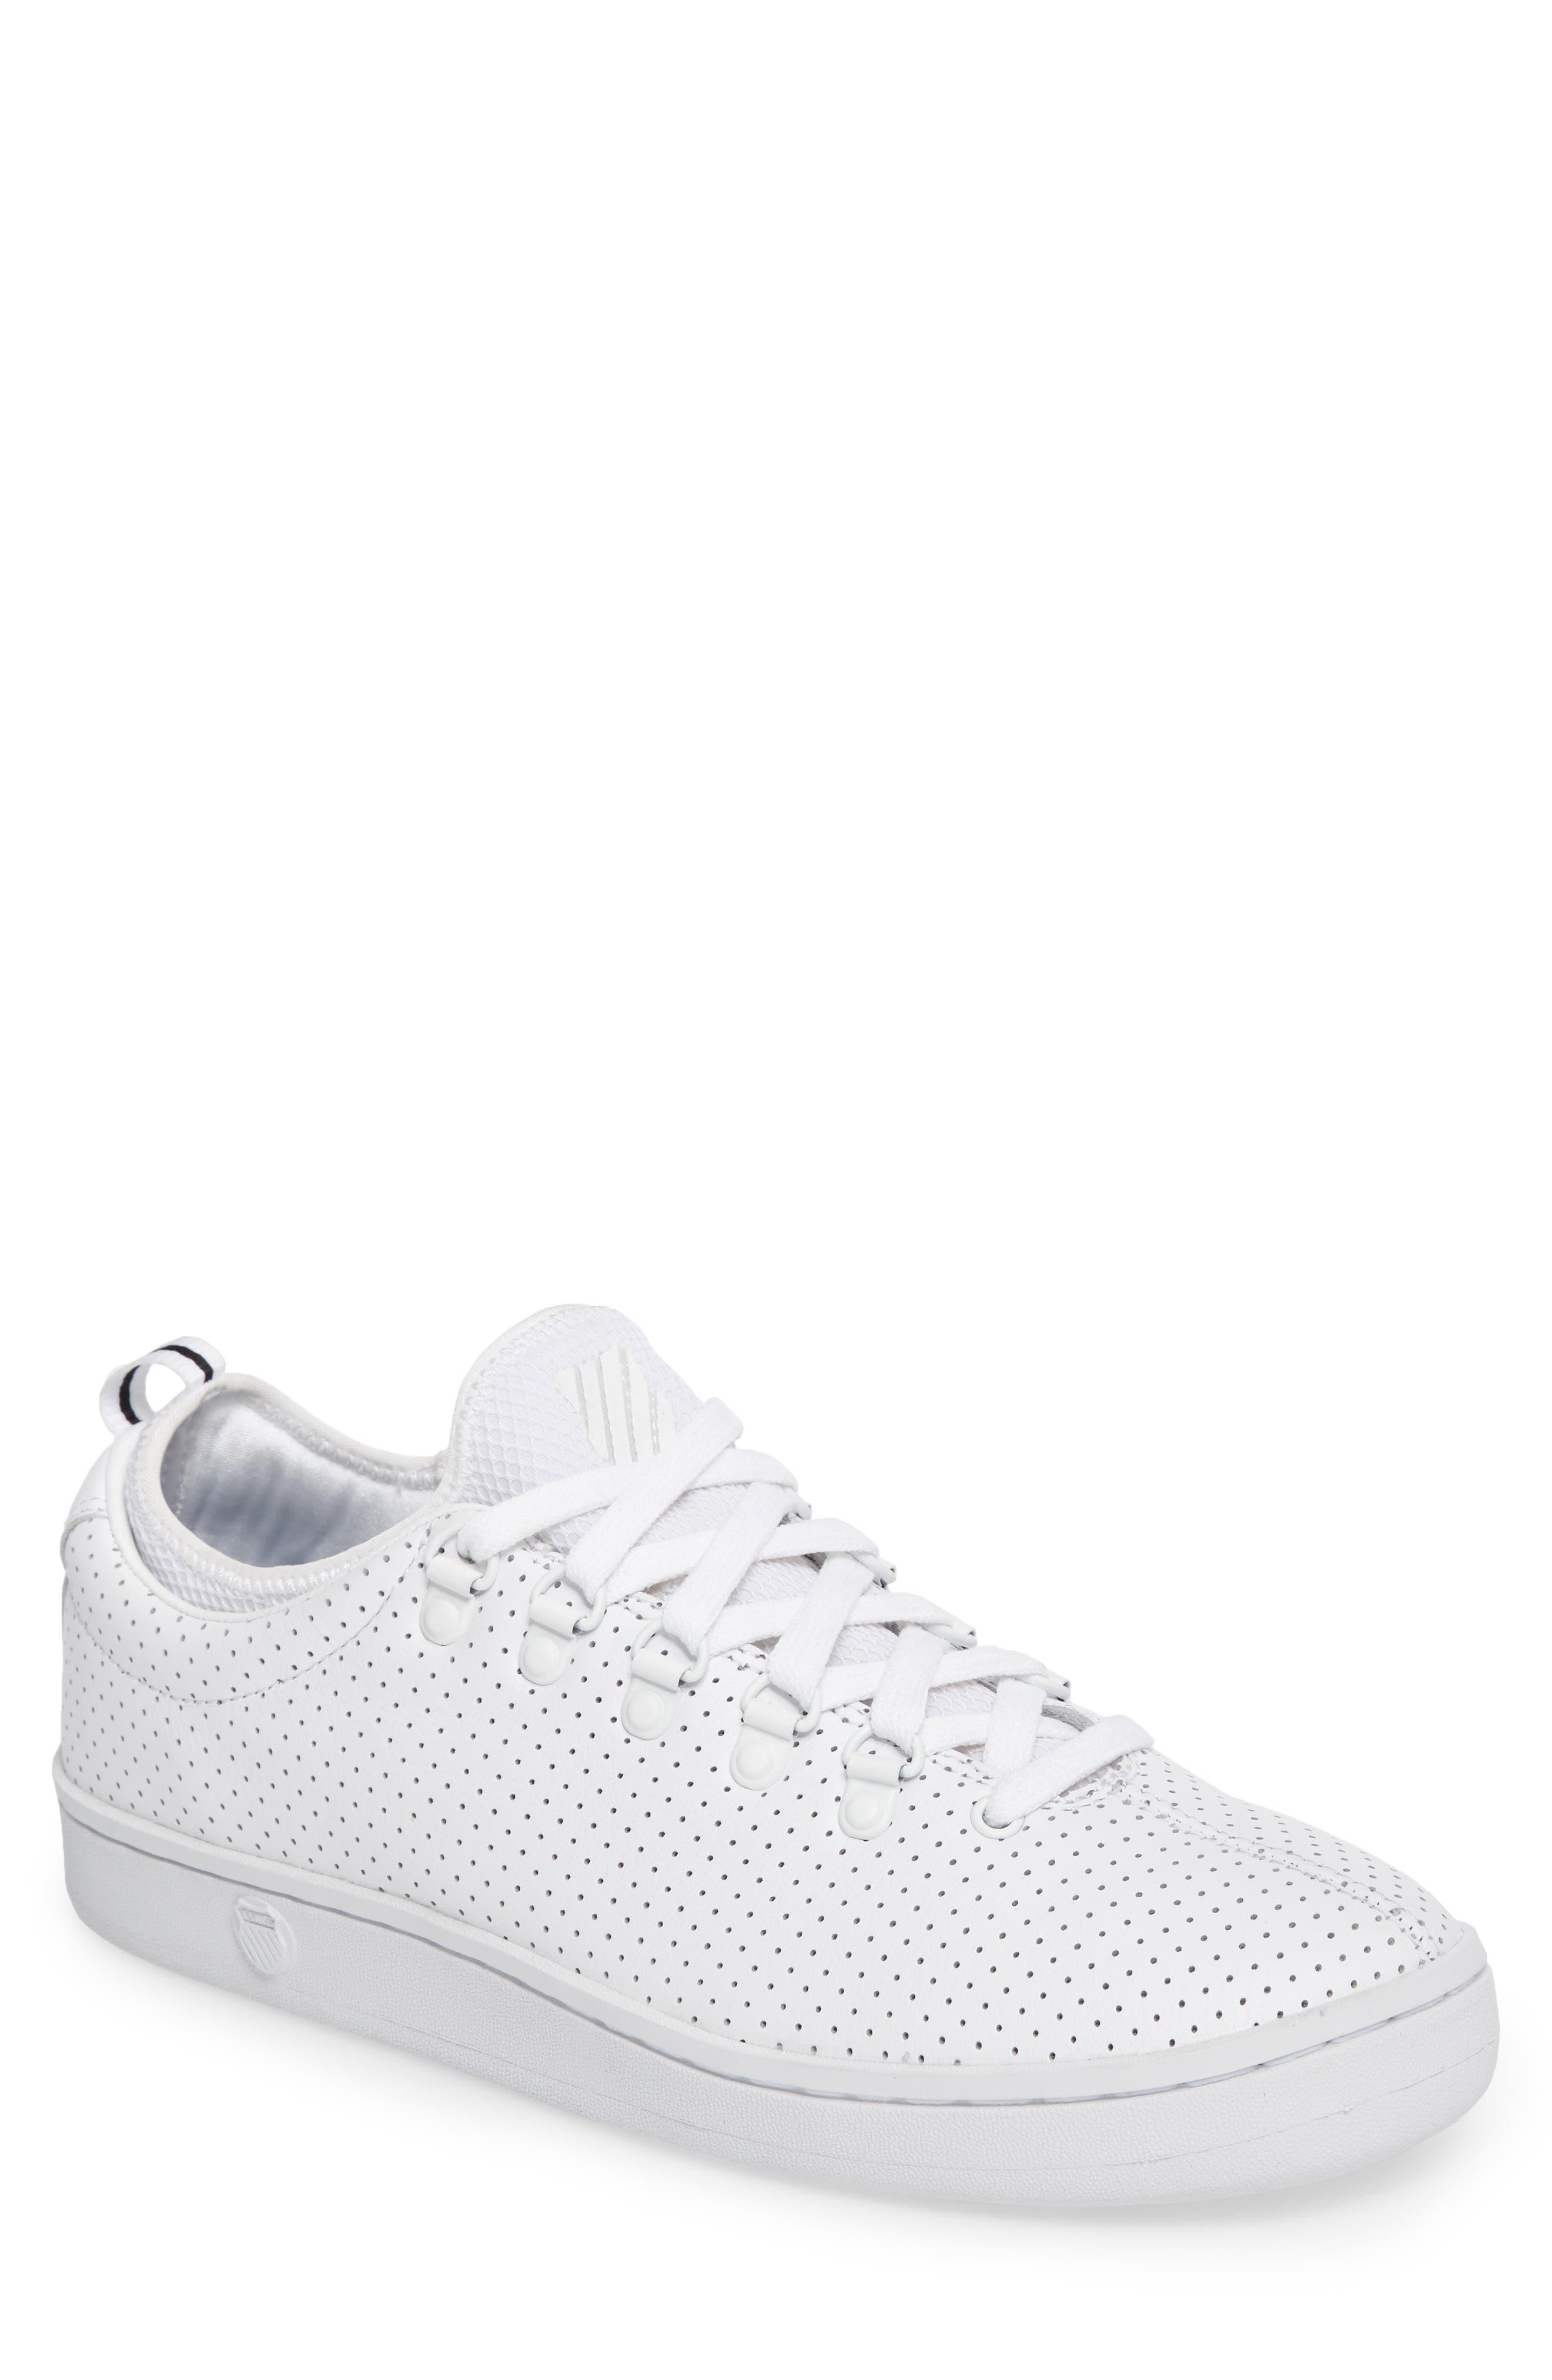 Alternate Image 1 Selected - K-Swiss Classic 88 Sport Sneaker (Men)